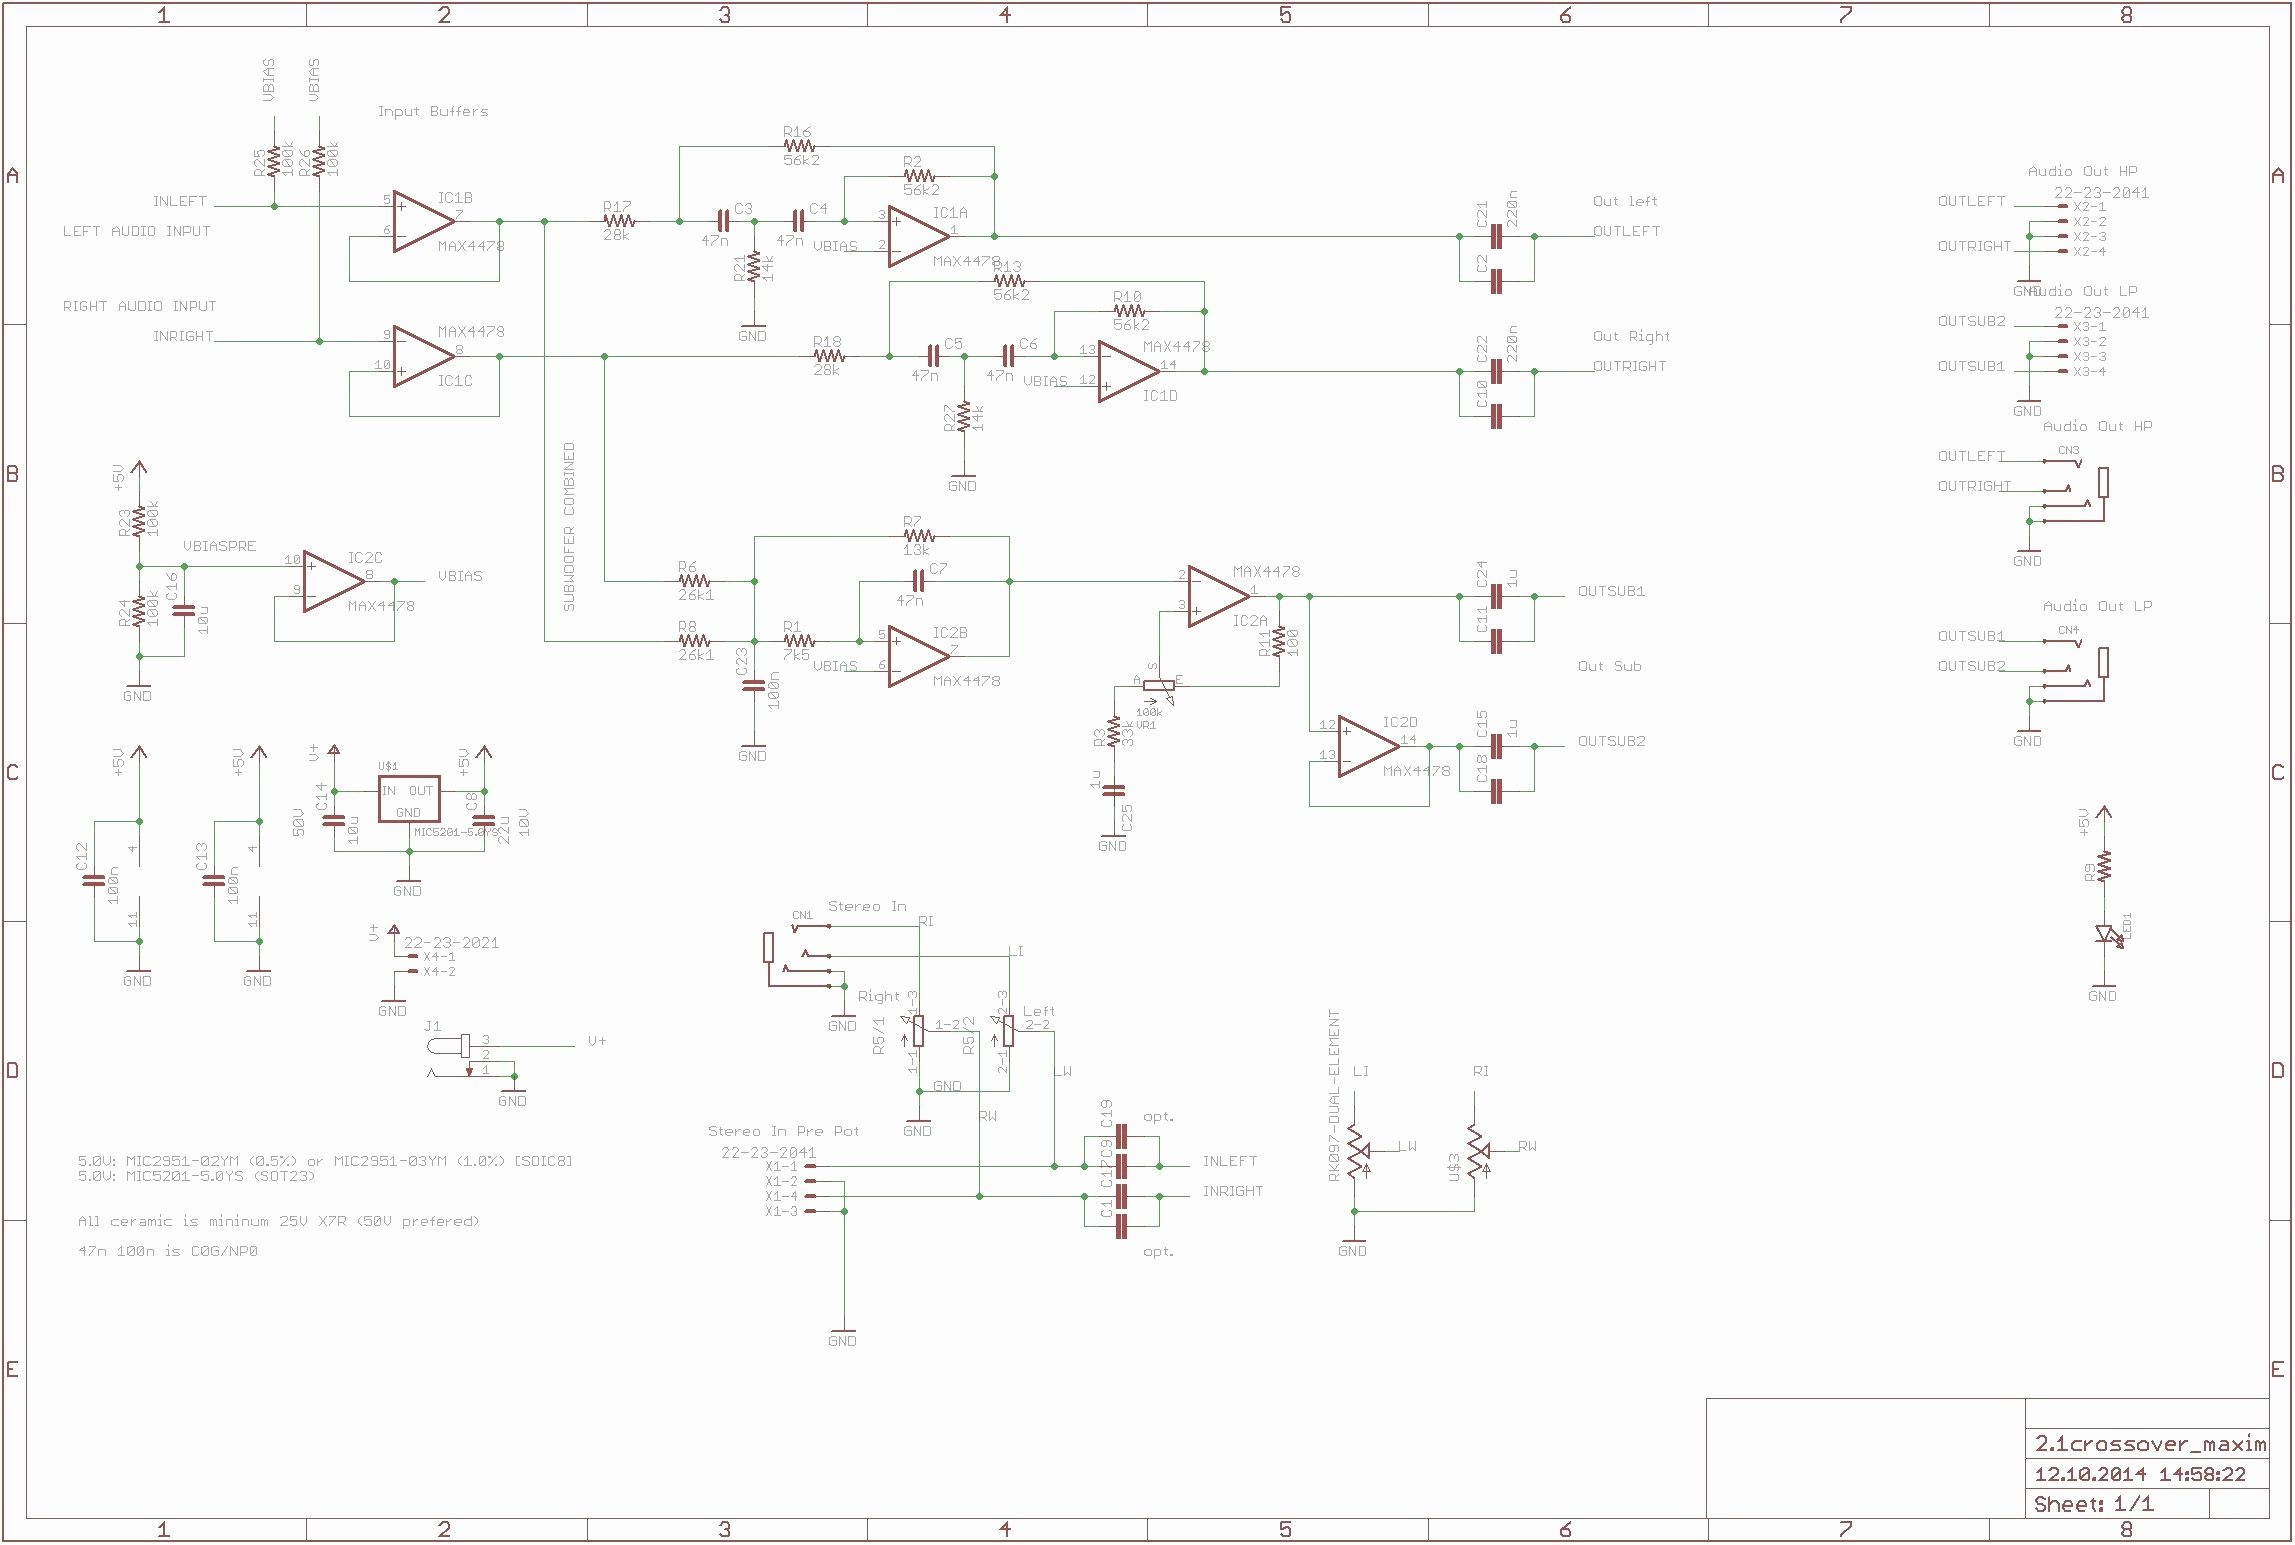 Fahrenheat Wiring Diagram Lovely T3 Light Fixture Wiring Diagram - Light Fixture Wiring Diagram